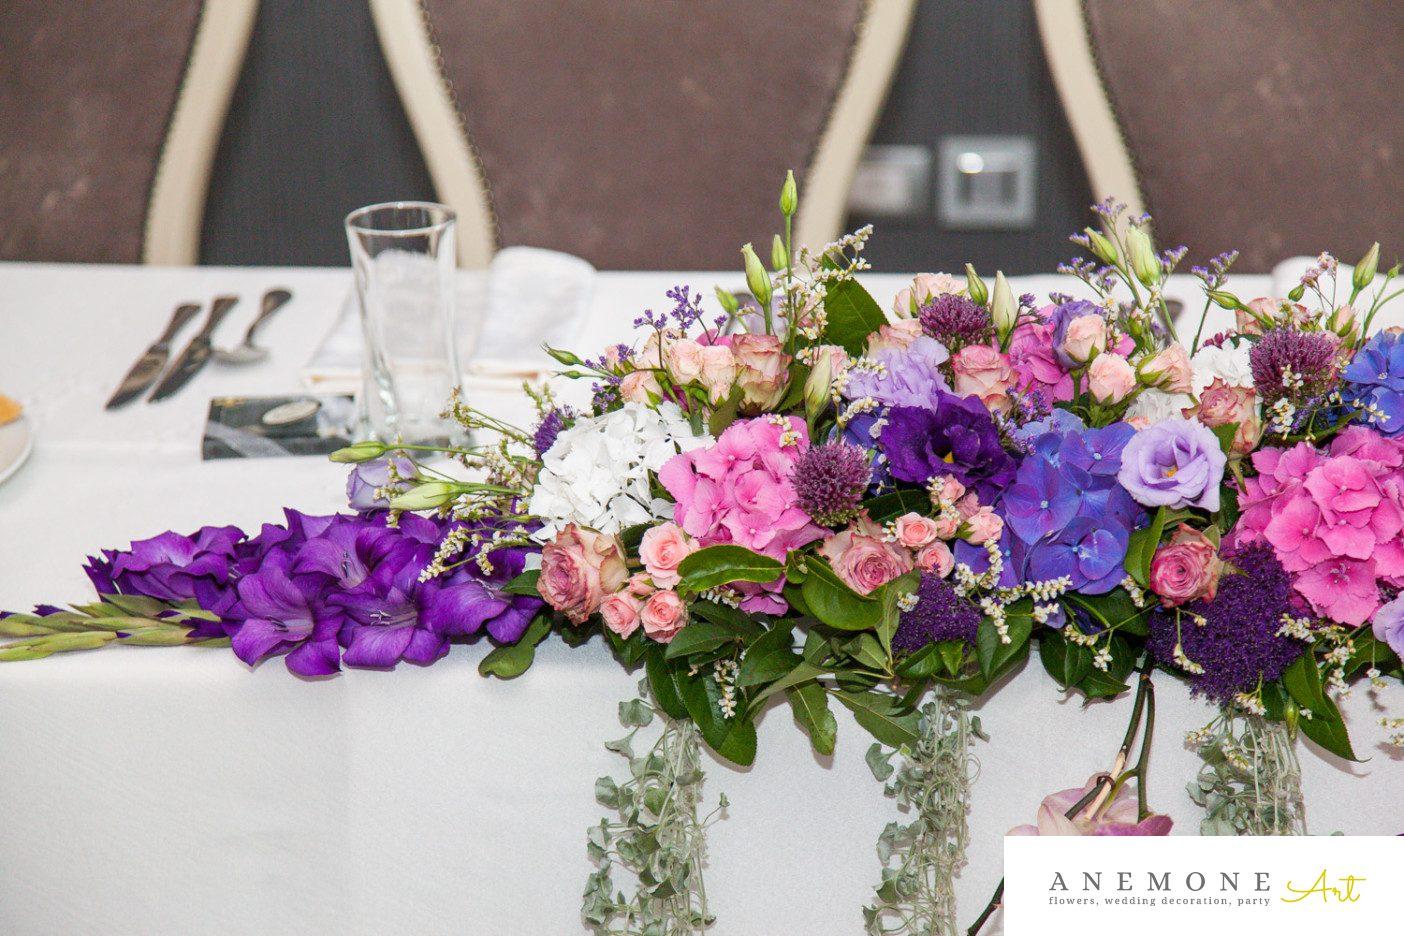 Poza, foto cu Flori de nunta mov, prezidiu, roz in Arad, Timisoara, Oradea (wedding flowers, bouquets) nunta Arad, Timisoara, Oradea